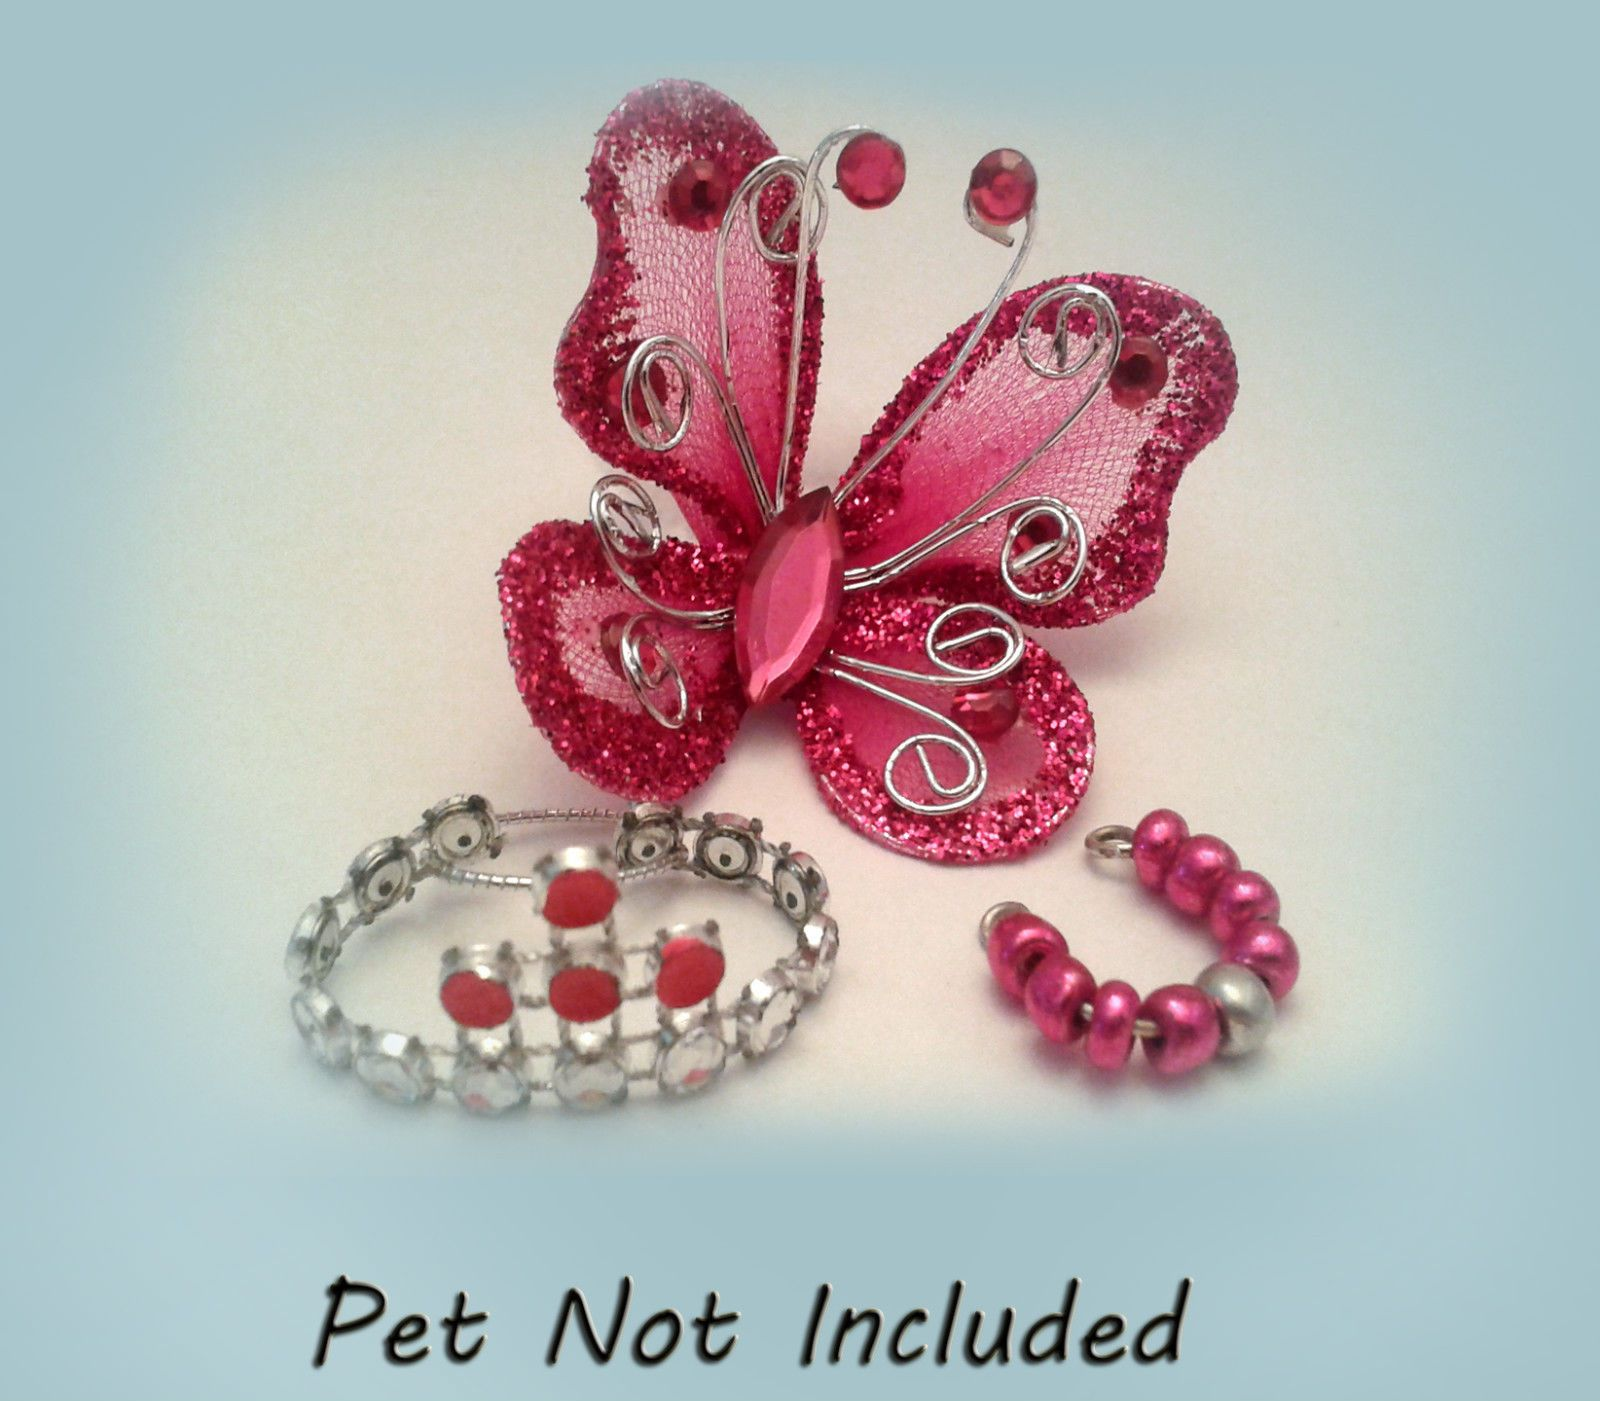 Littlest Pet Shop clothes & accessories Pink Fairy LPS outfit 9 lot | eBay